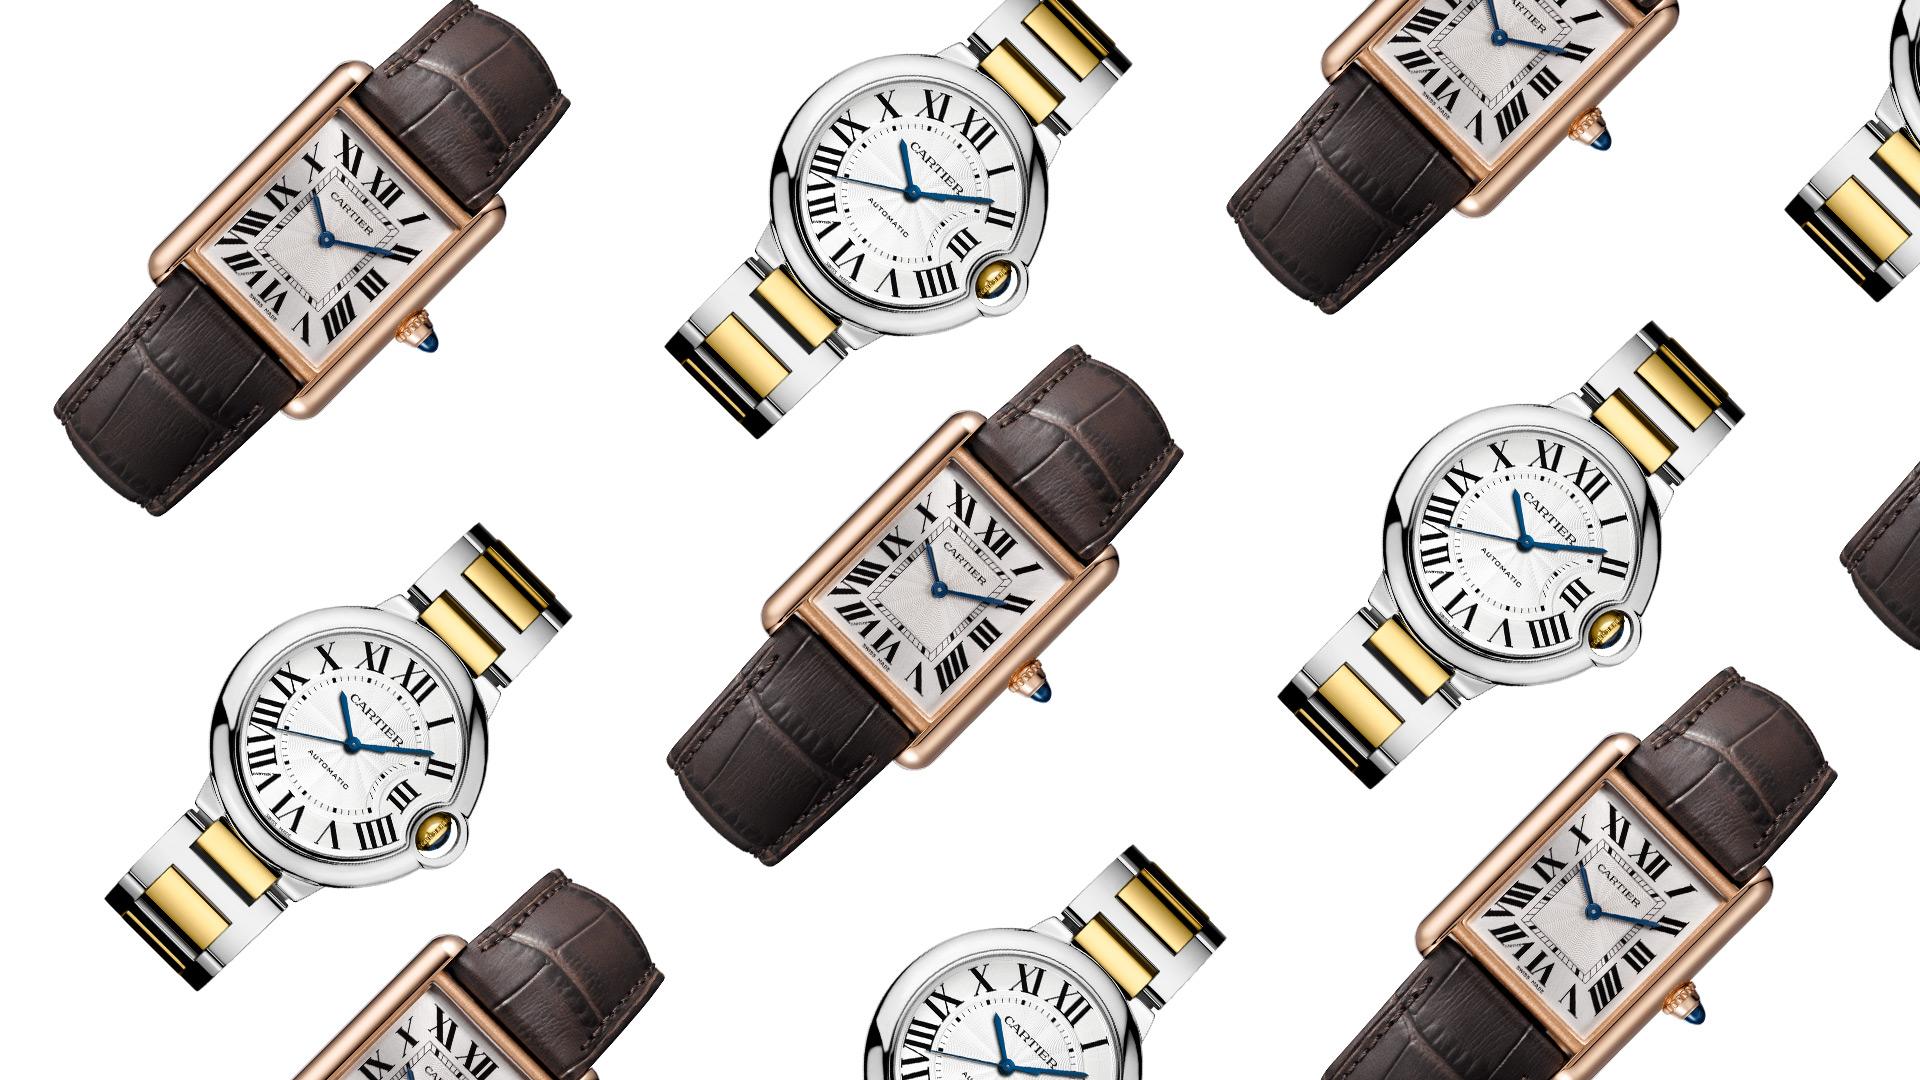 M2 2021 Luxury Watch Preview Cartier   M2 Magazine 1920x1080